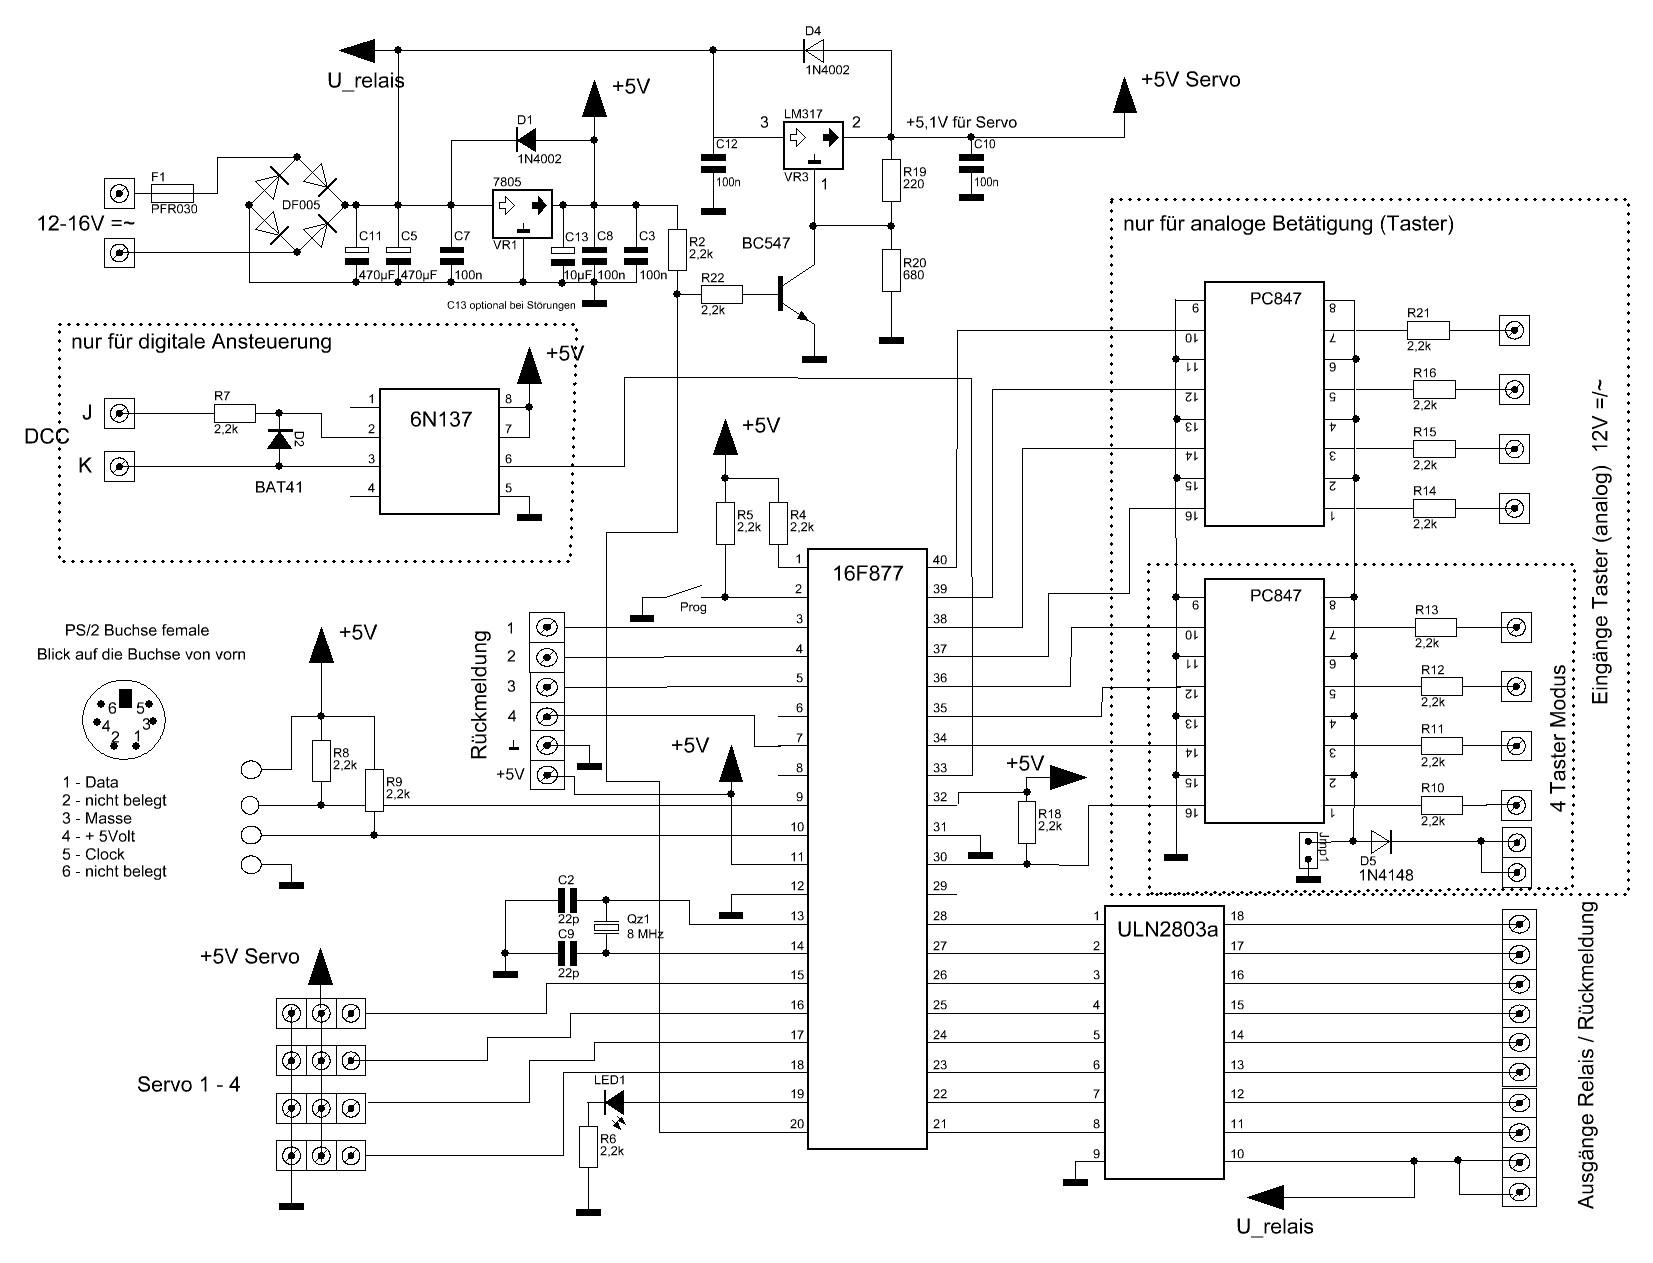 Fantastisch Iveco Schaltplan Ideen - Der Schaltplan - triangre.info